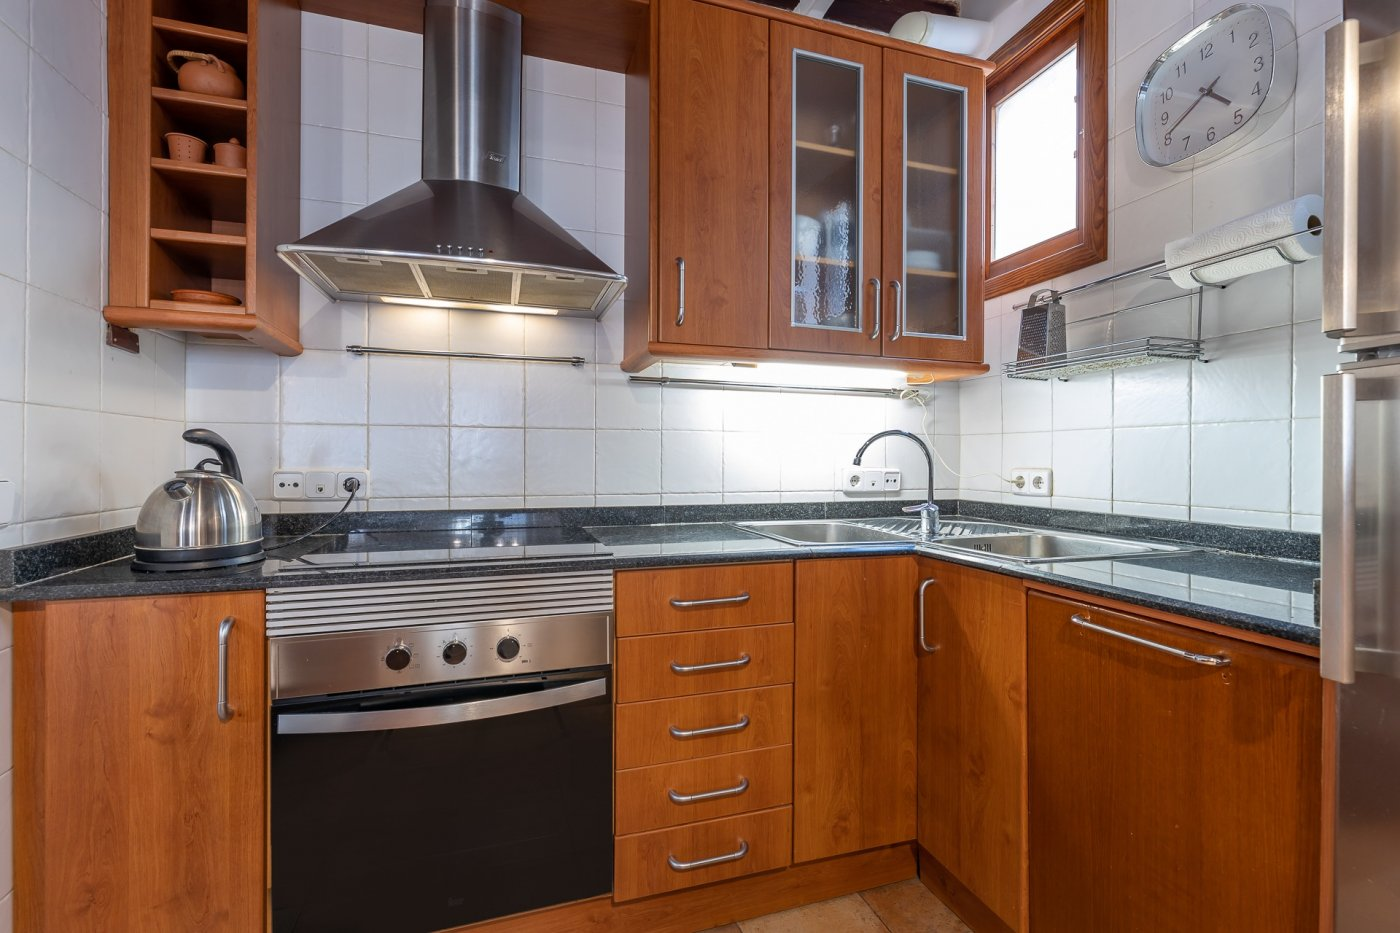 Espectacular apartamento en centro de palma - imagenInmueble23